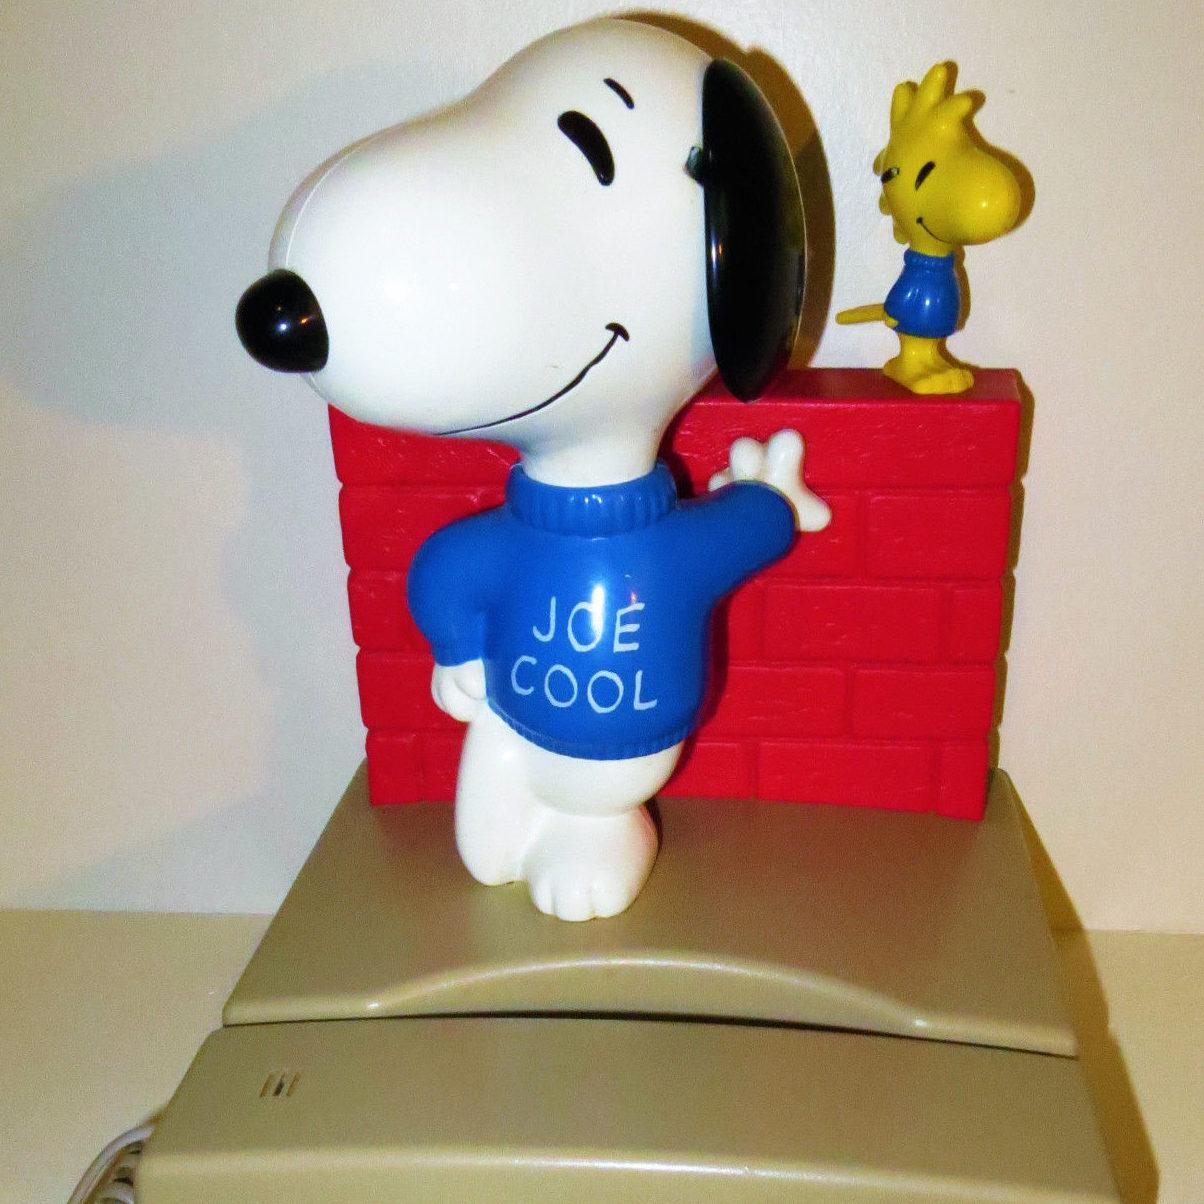 Snoopy Joe Cool Telephone with Woodstock